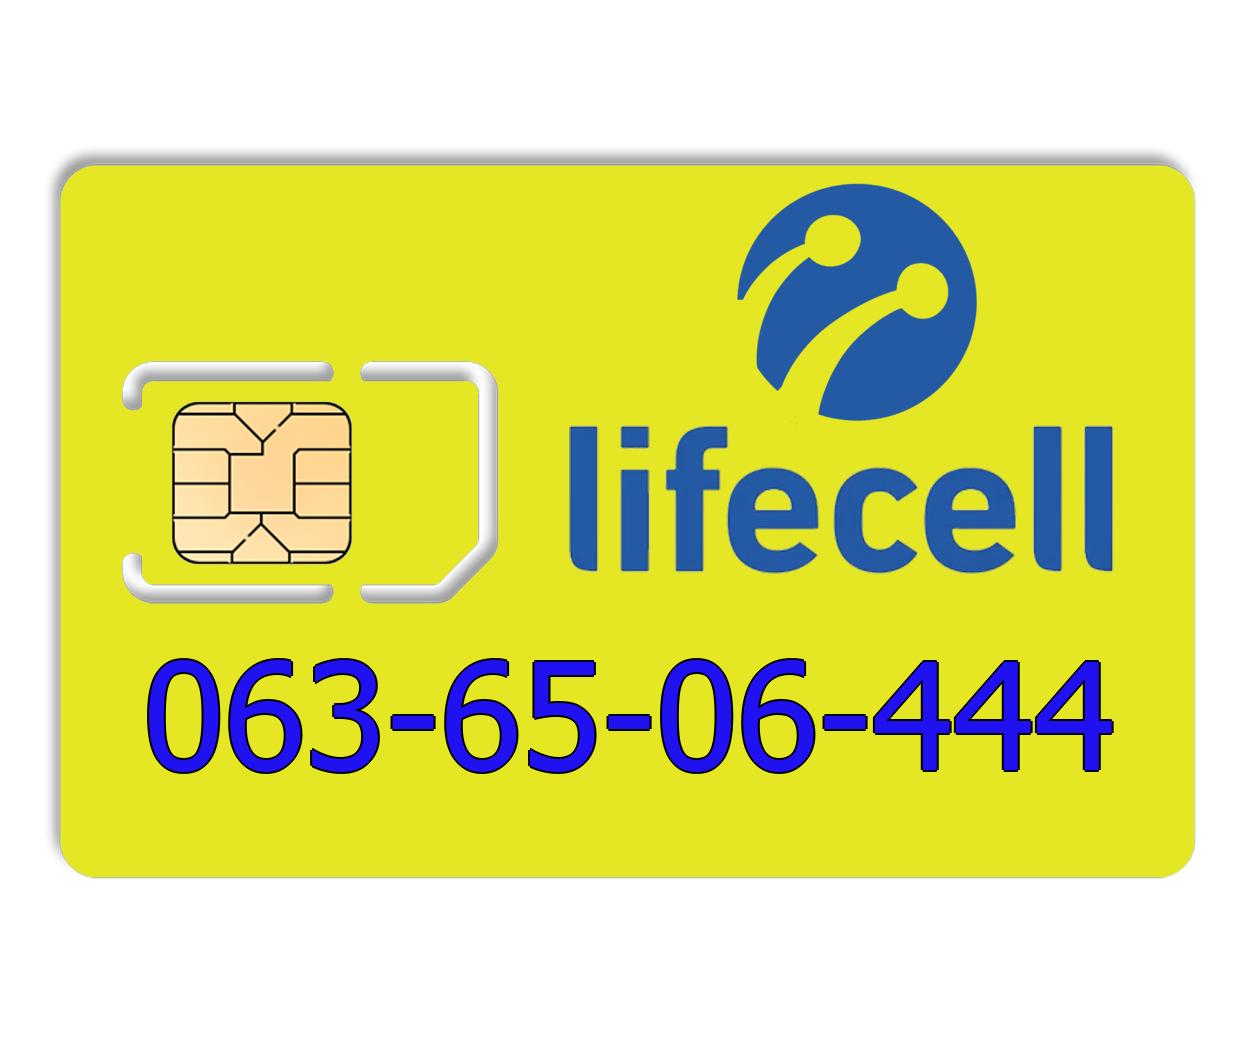 Красивий номер lifecell 063-65-06-444